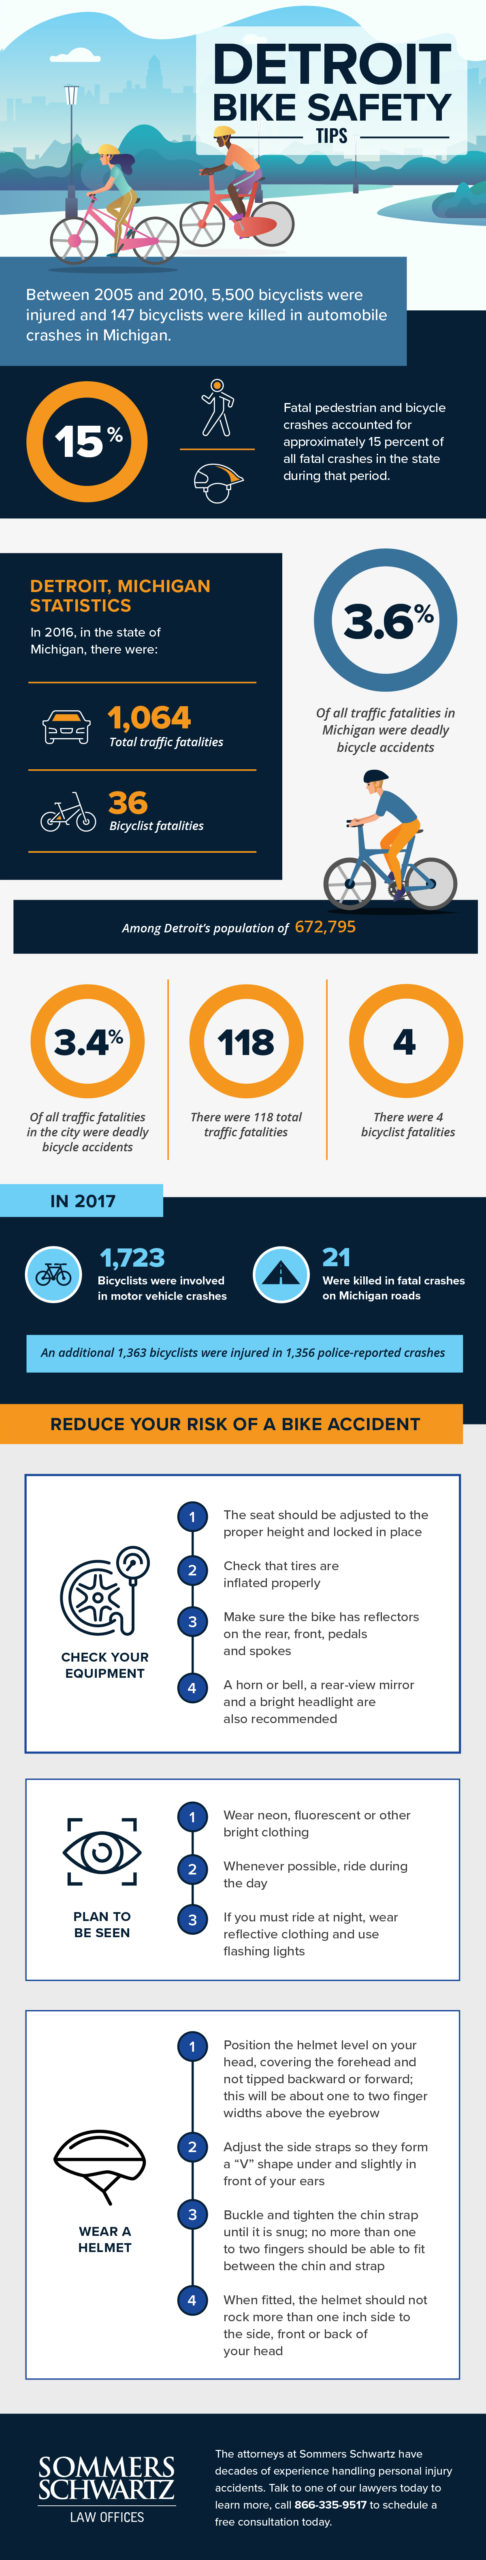 Detroit Bike Safety scaled